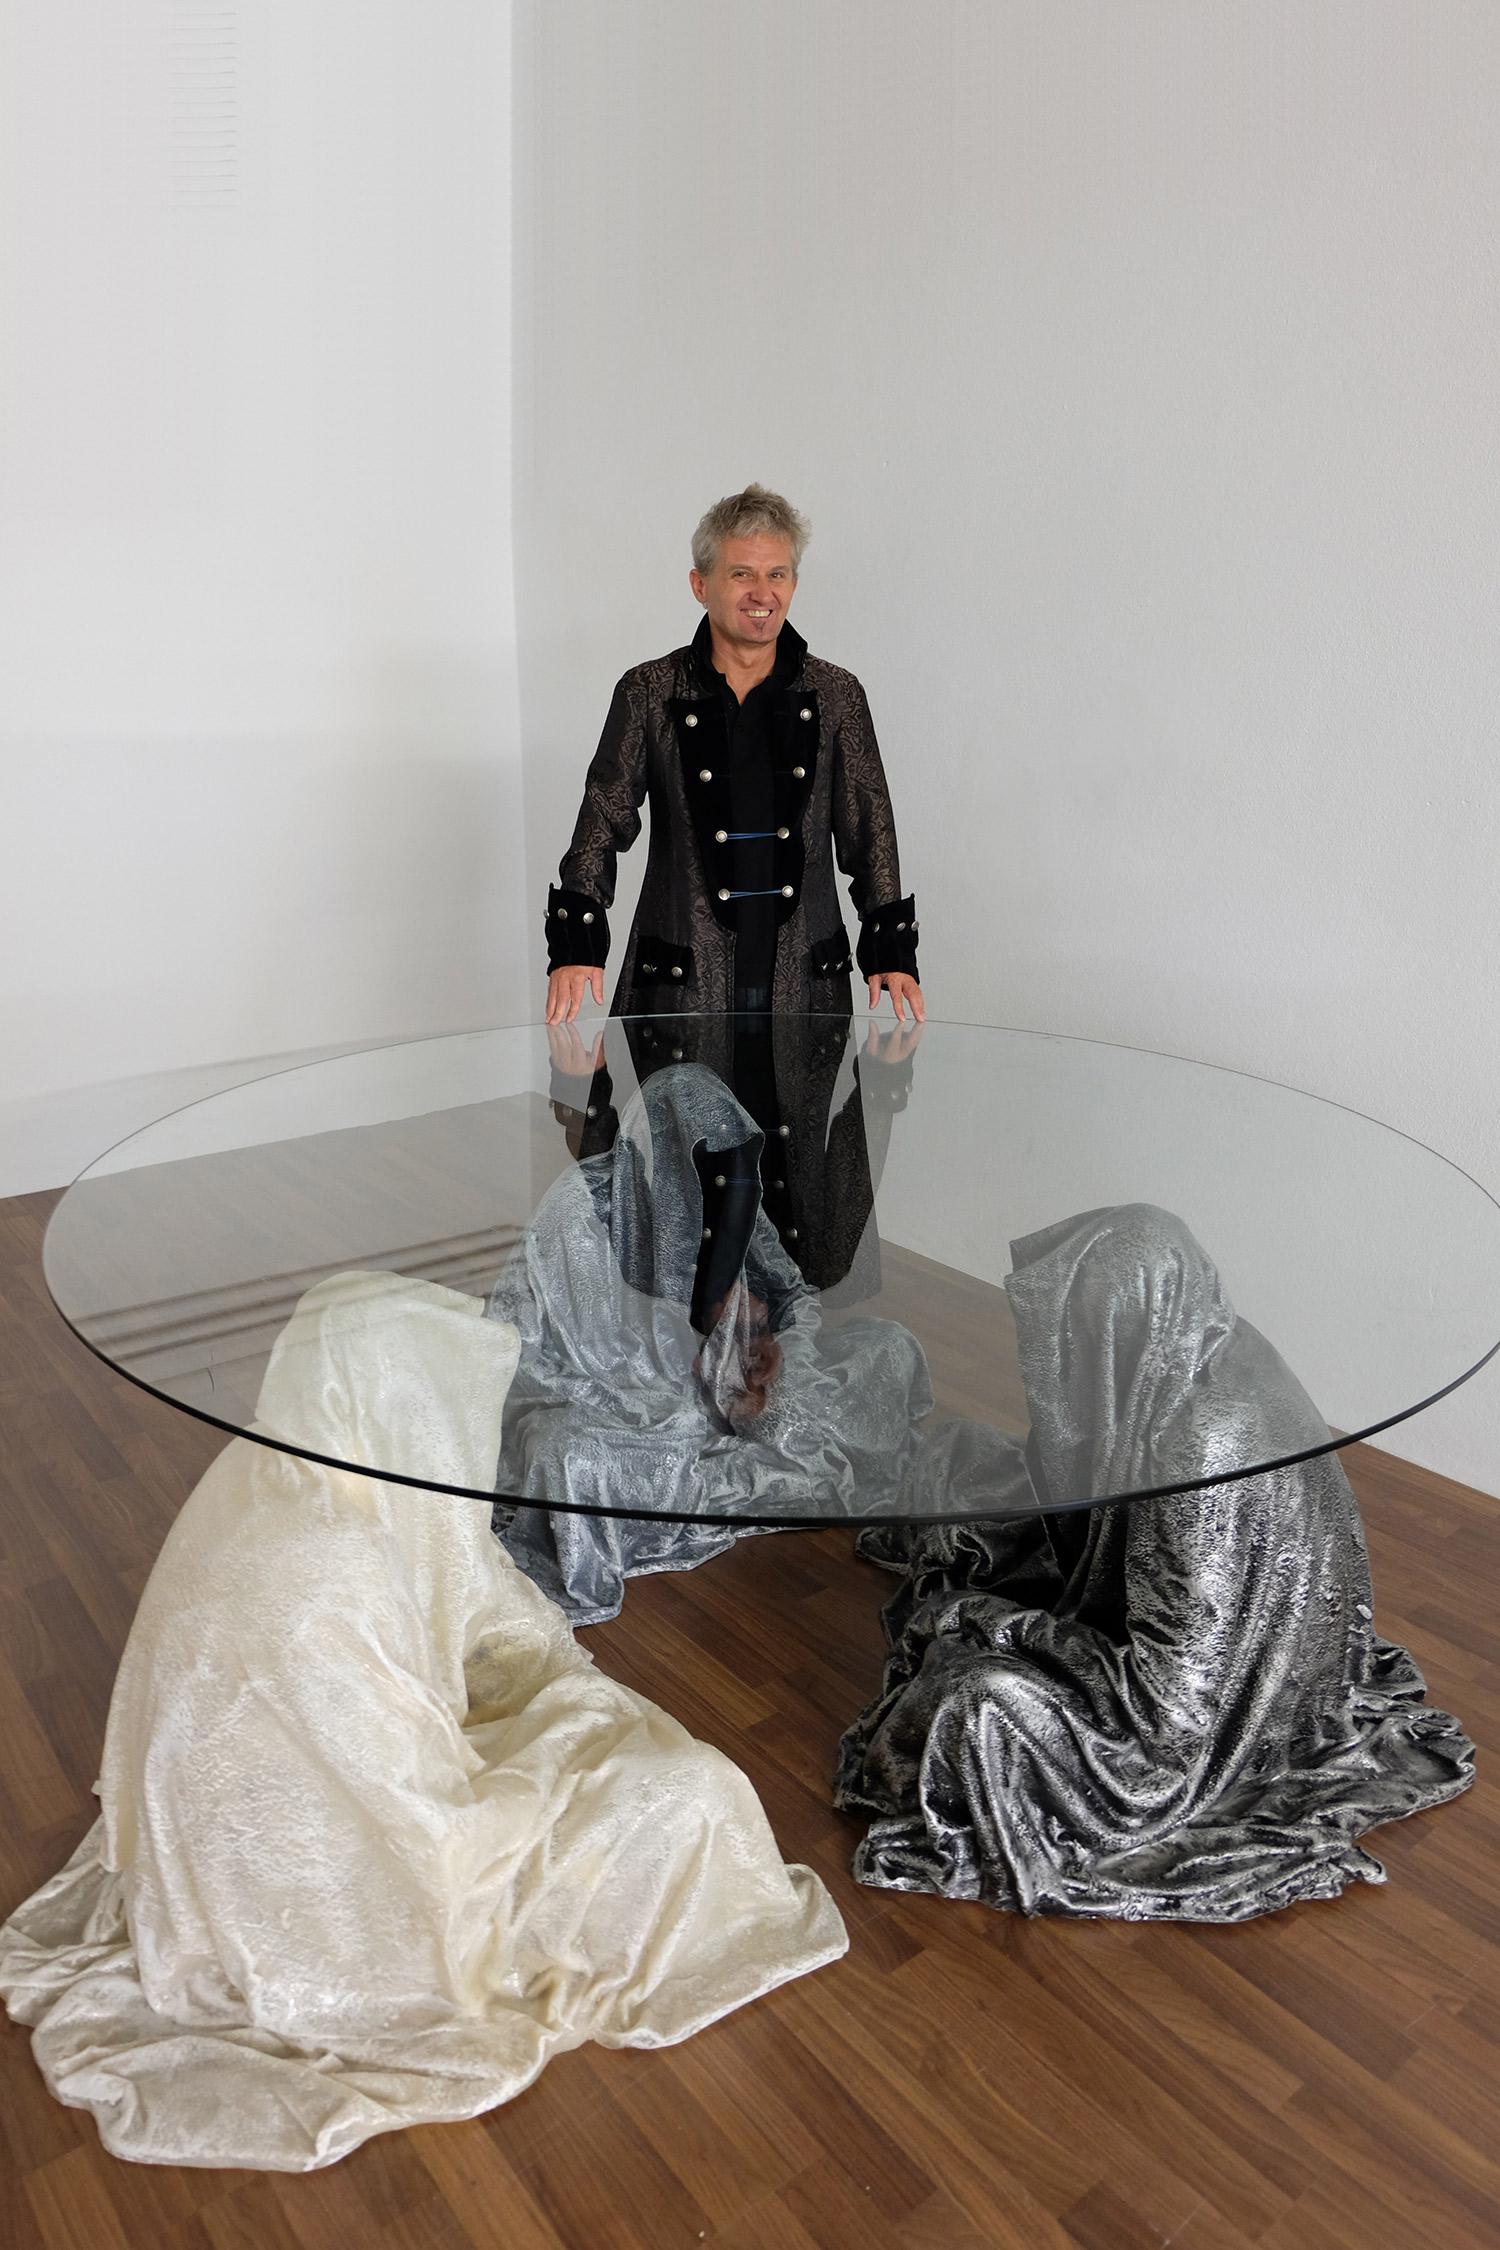 exclusive-furniture-guardian-table-glass-sculpture-statue-contemporary-light-art-design-antique-fine-art-manfred-kili-kielnhofer-4347y